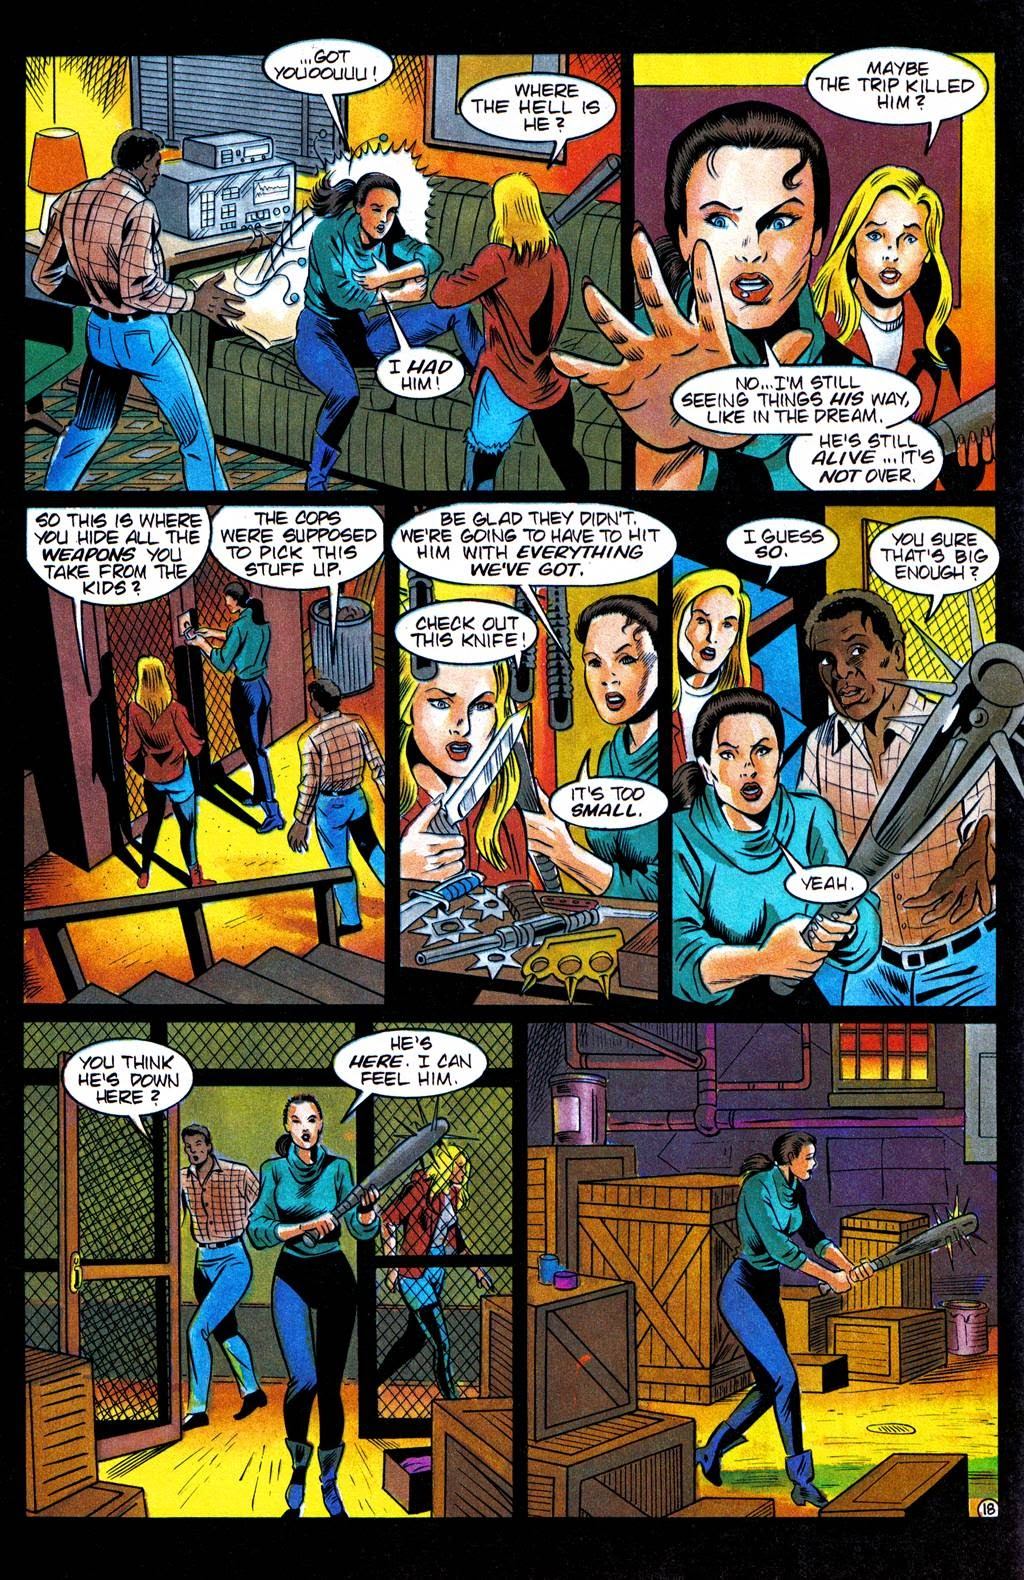 Read online Freddy's Dead: The Final Nightmare comic -  Issue #3 - 21